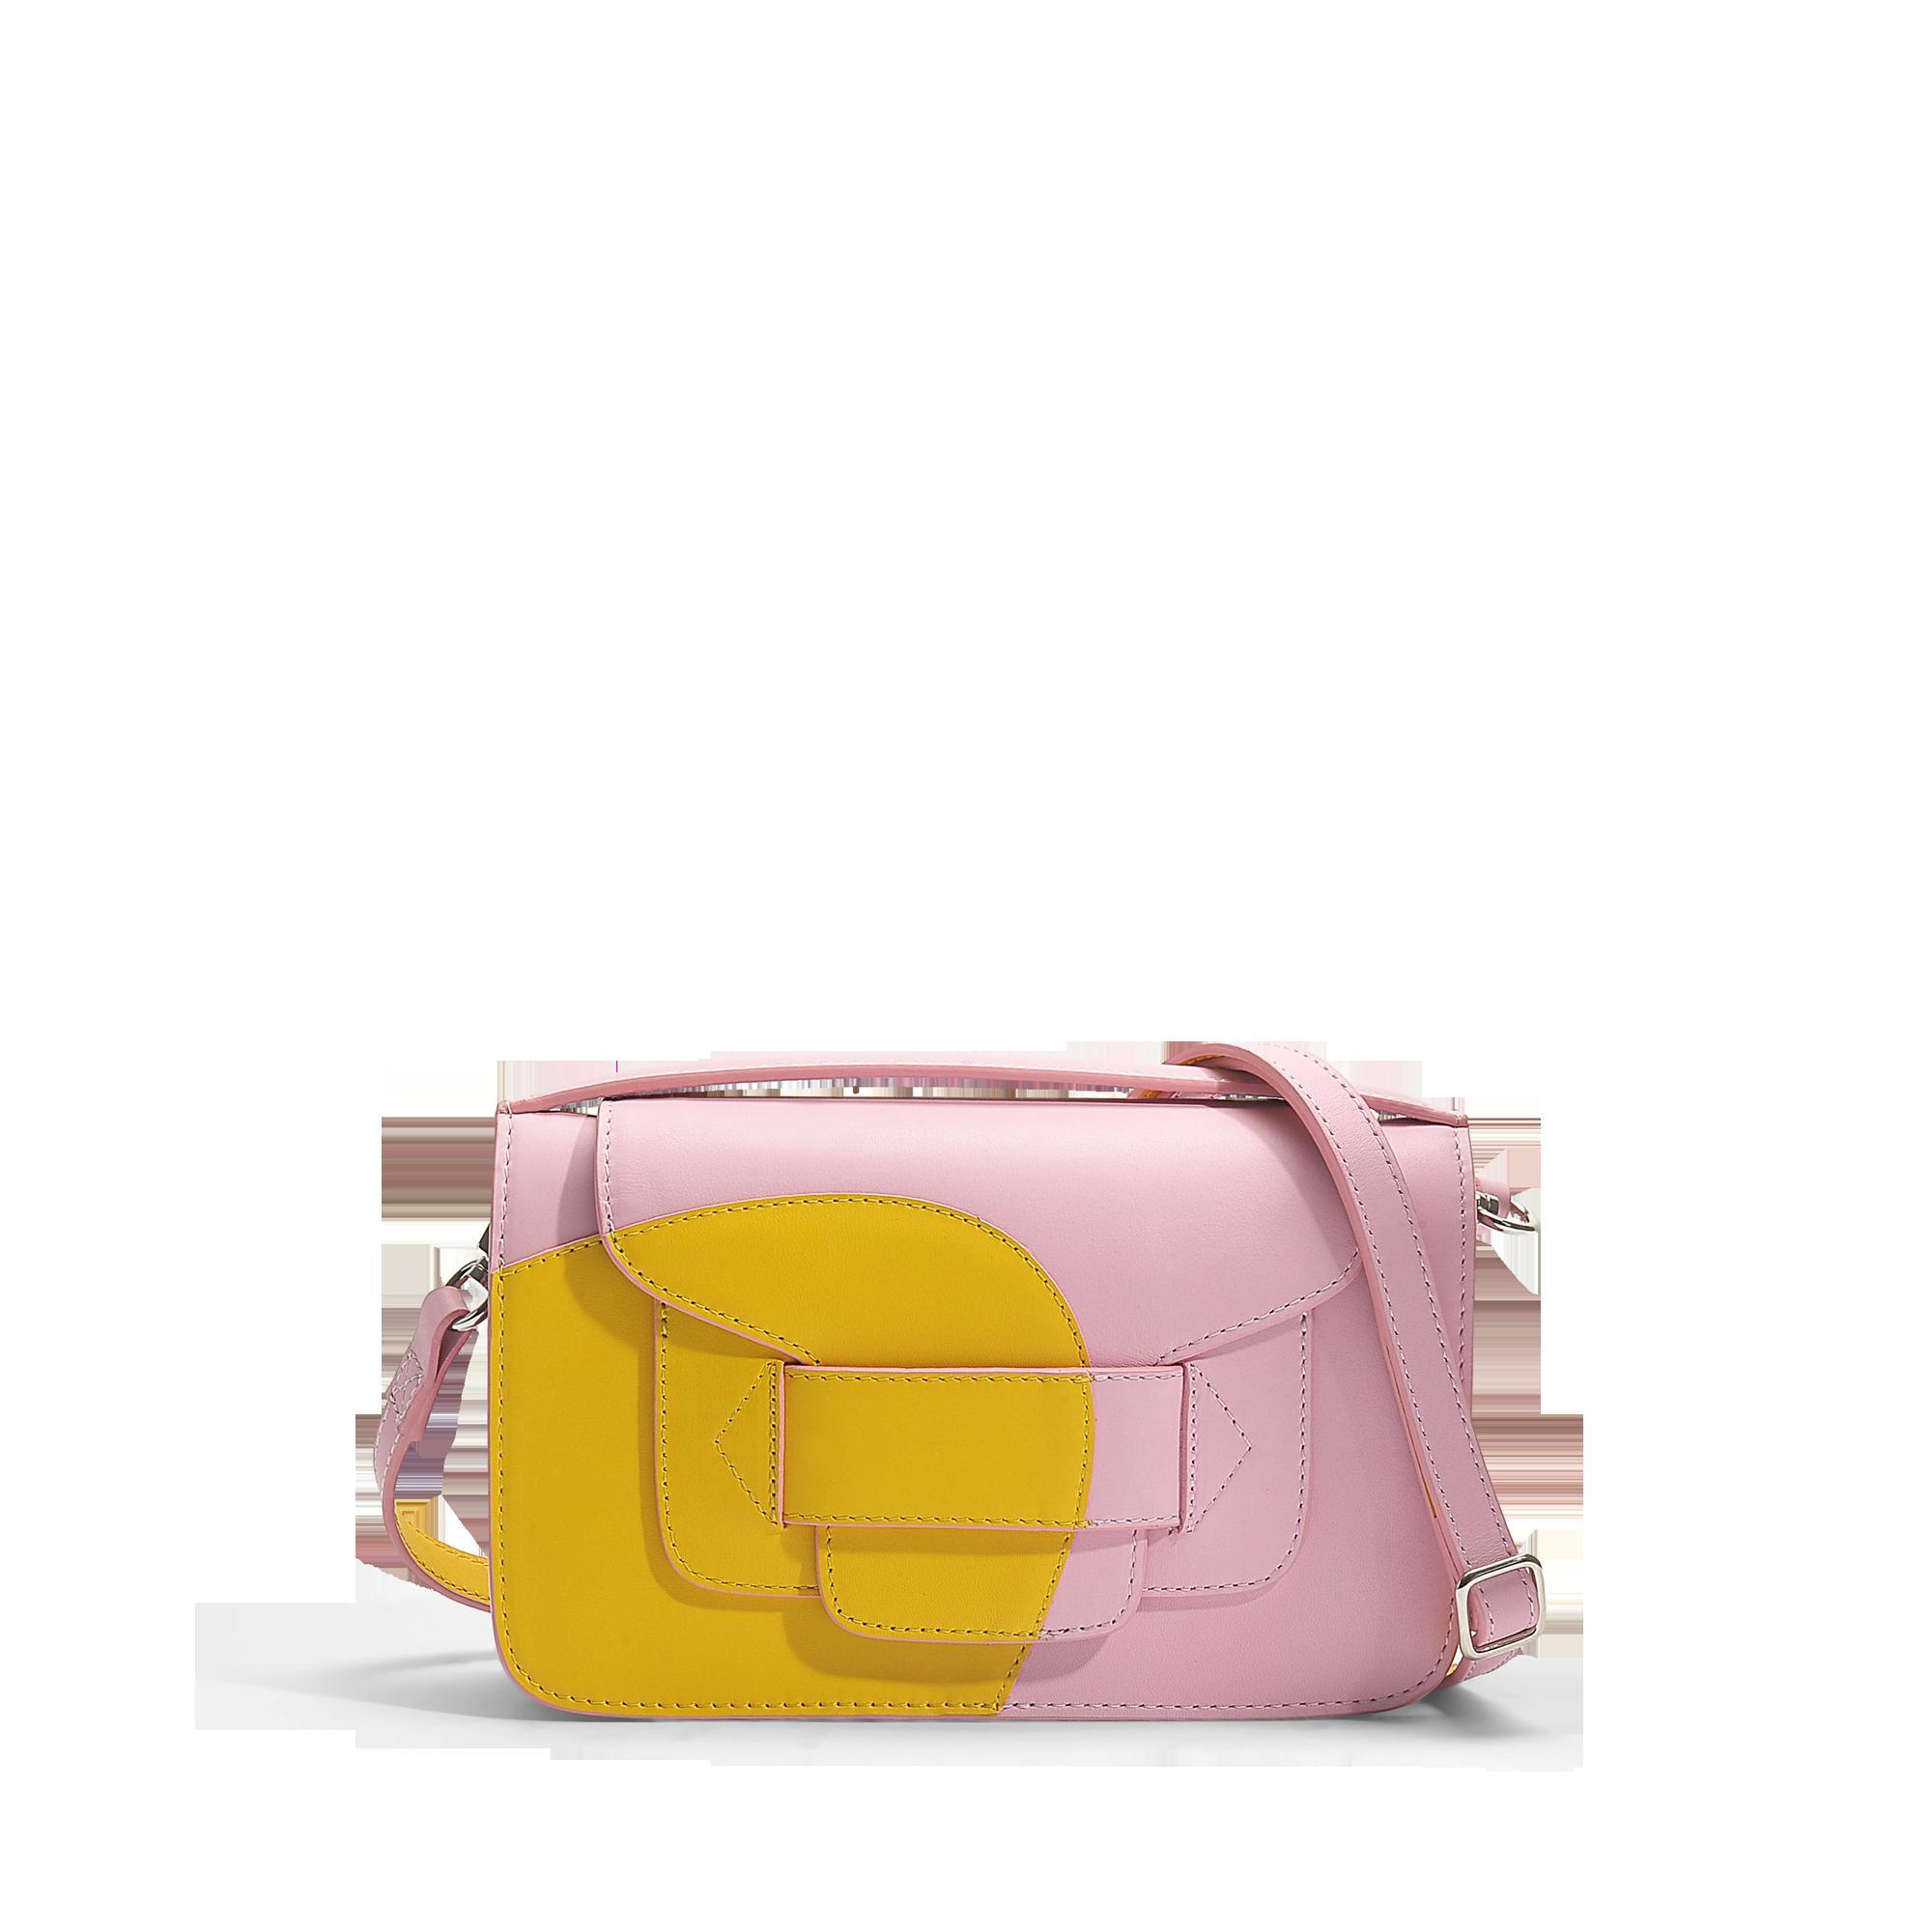 Pierre Hardy H Clutch Bag In Yellow Pink Calfskin